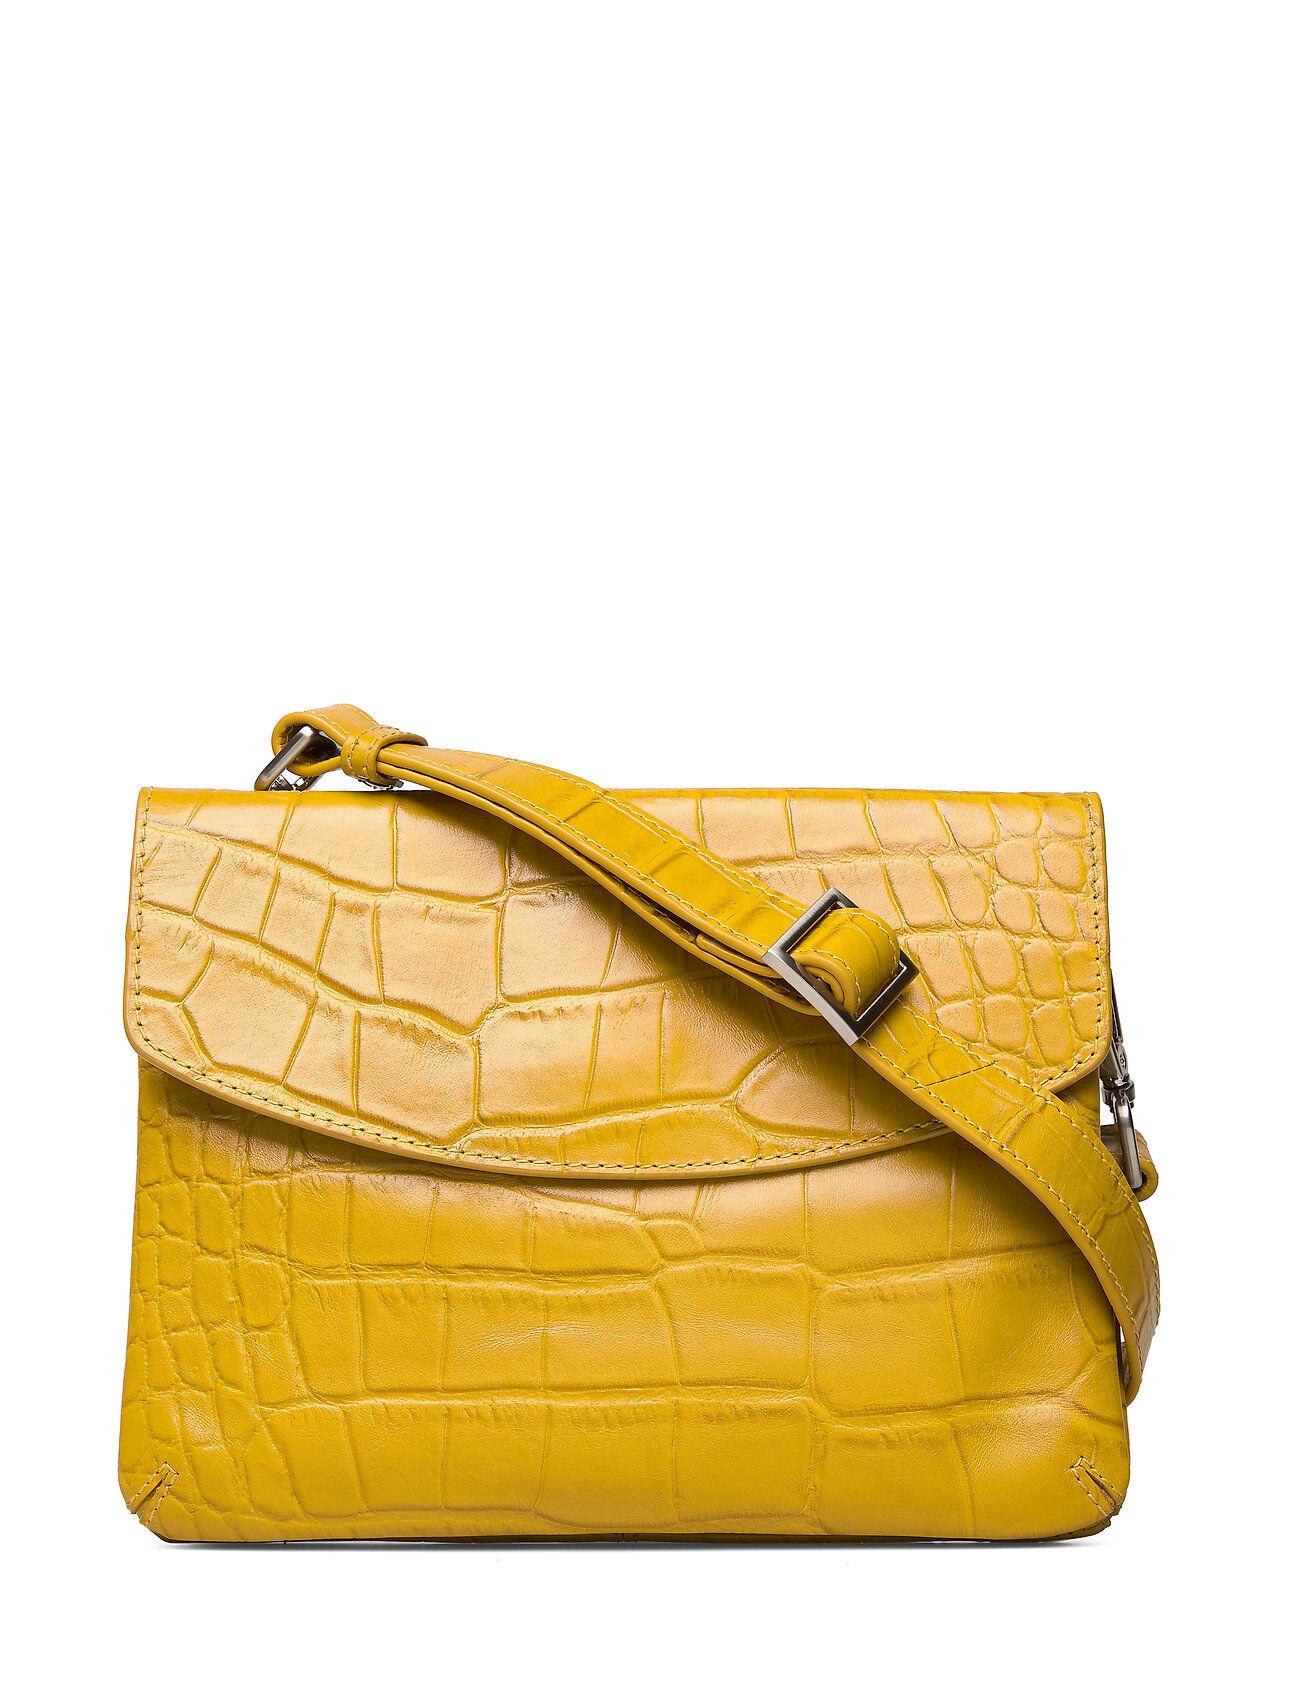 Adax Teramo Shoulder Bag Malou Bags Small Shoulder Bags - Crossbody Bags Keltainen Adax